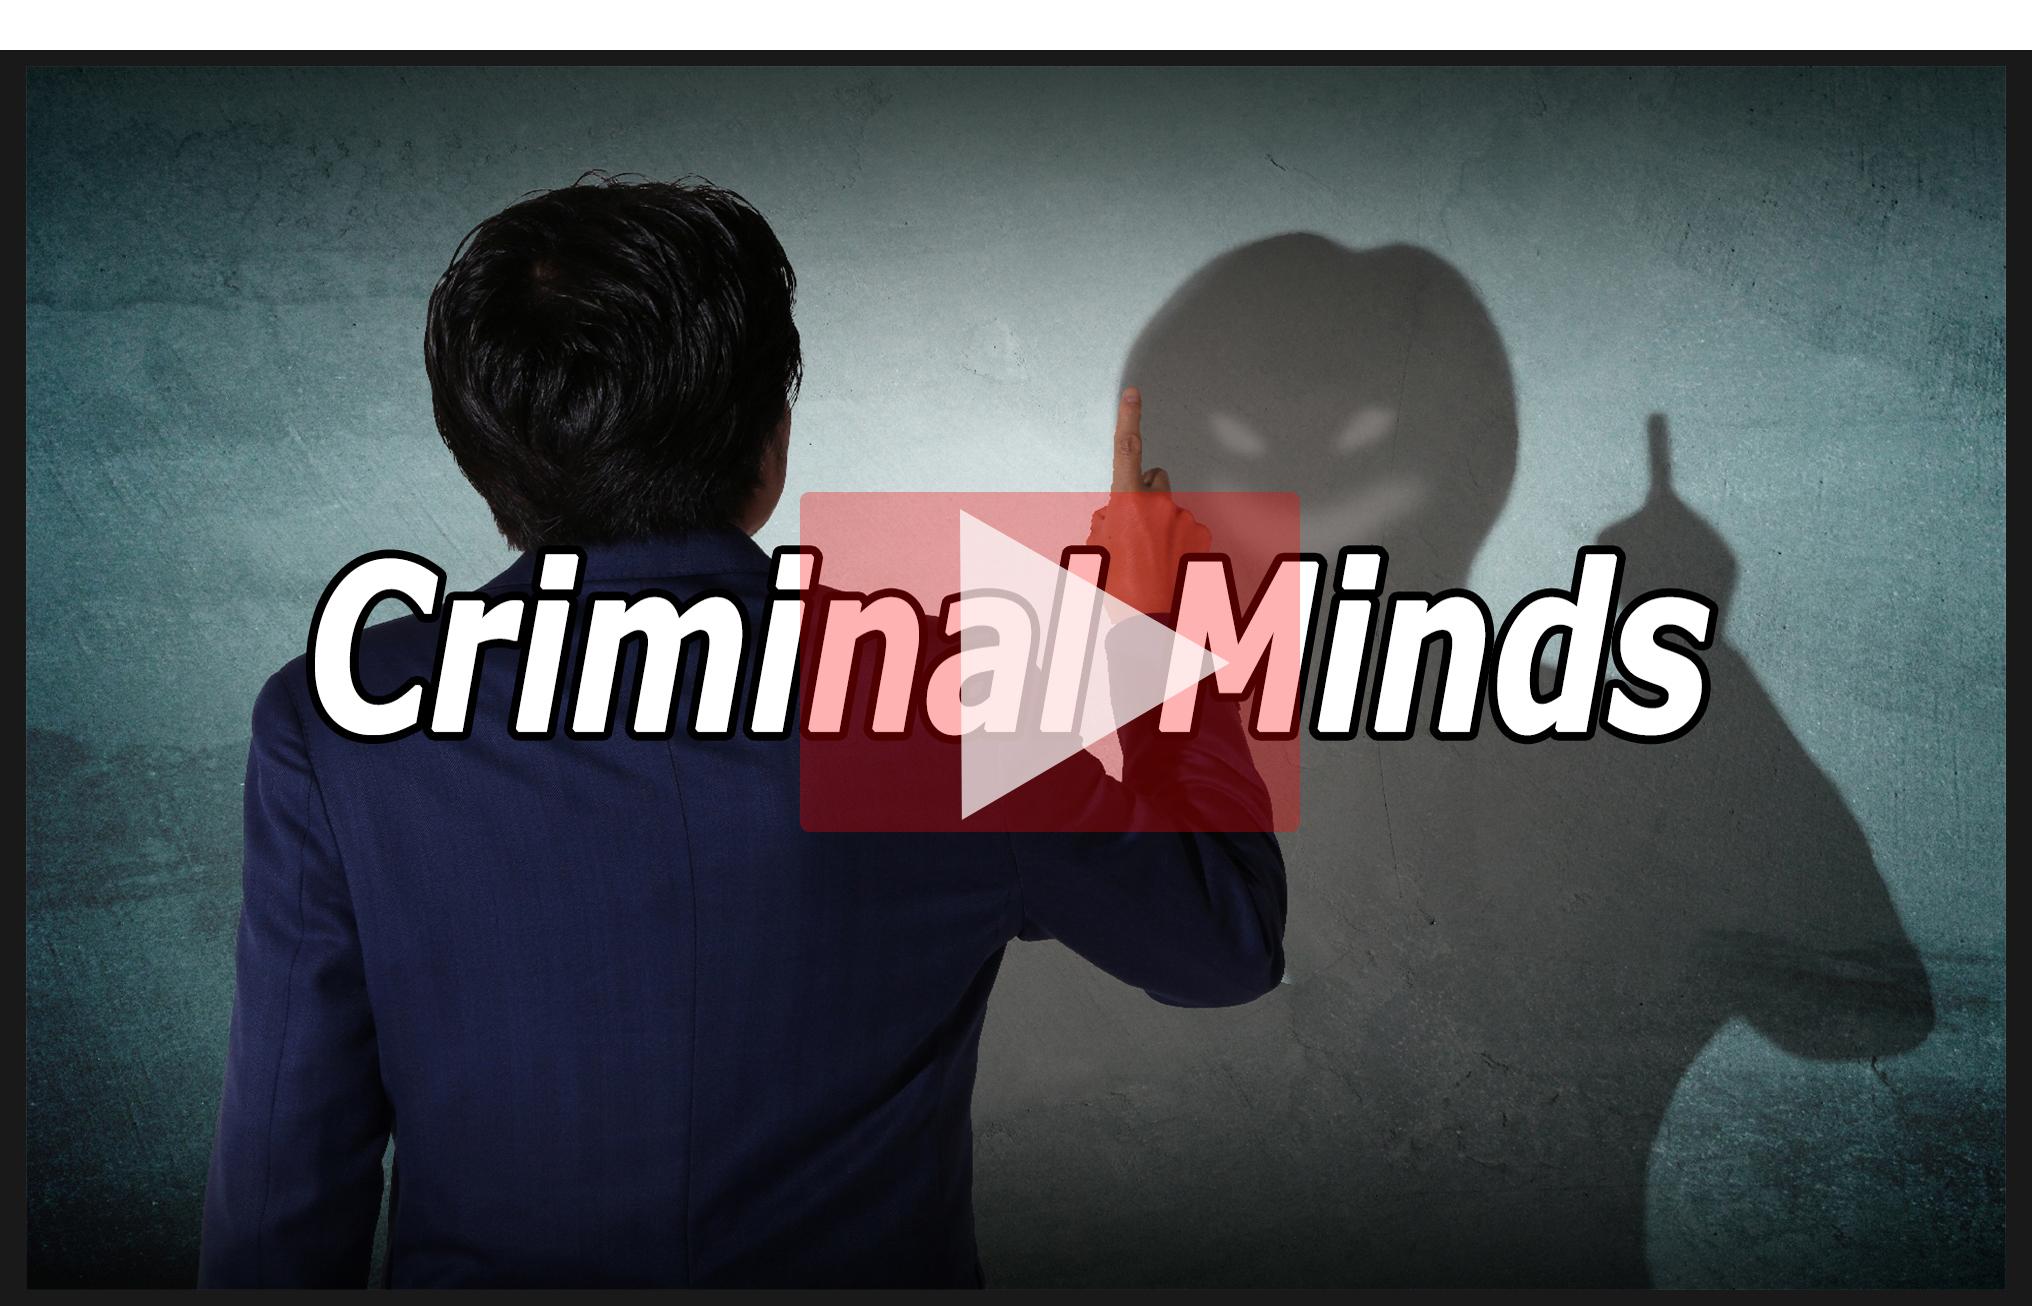 Climinal-mind